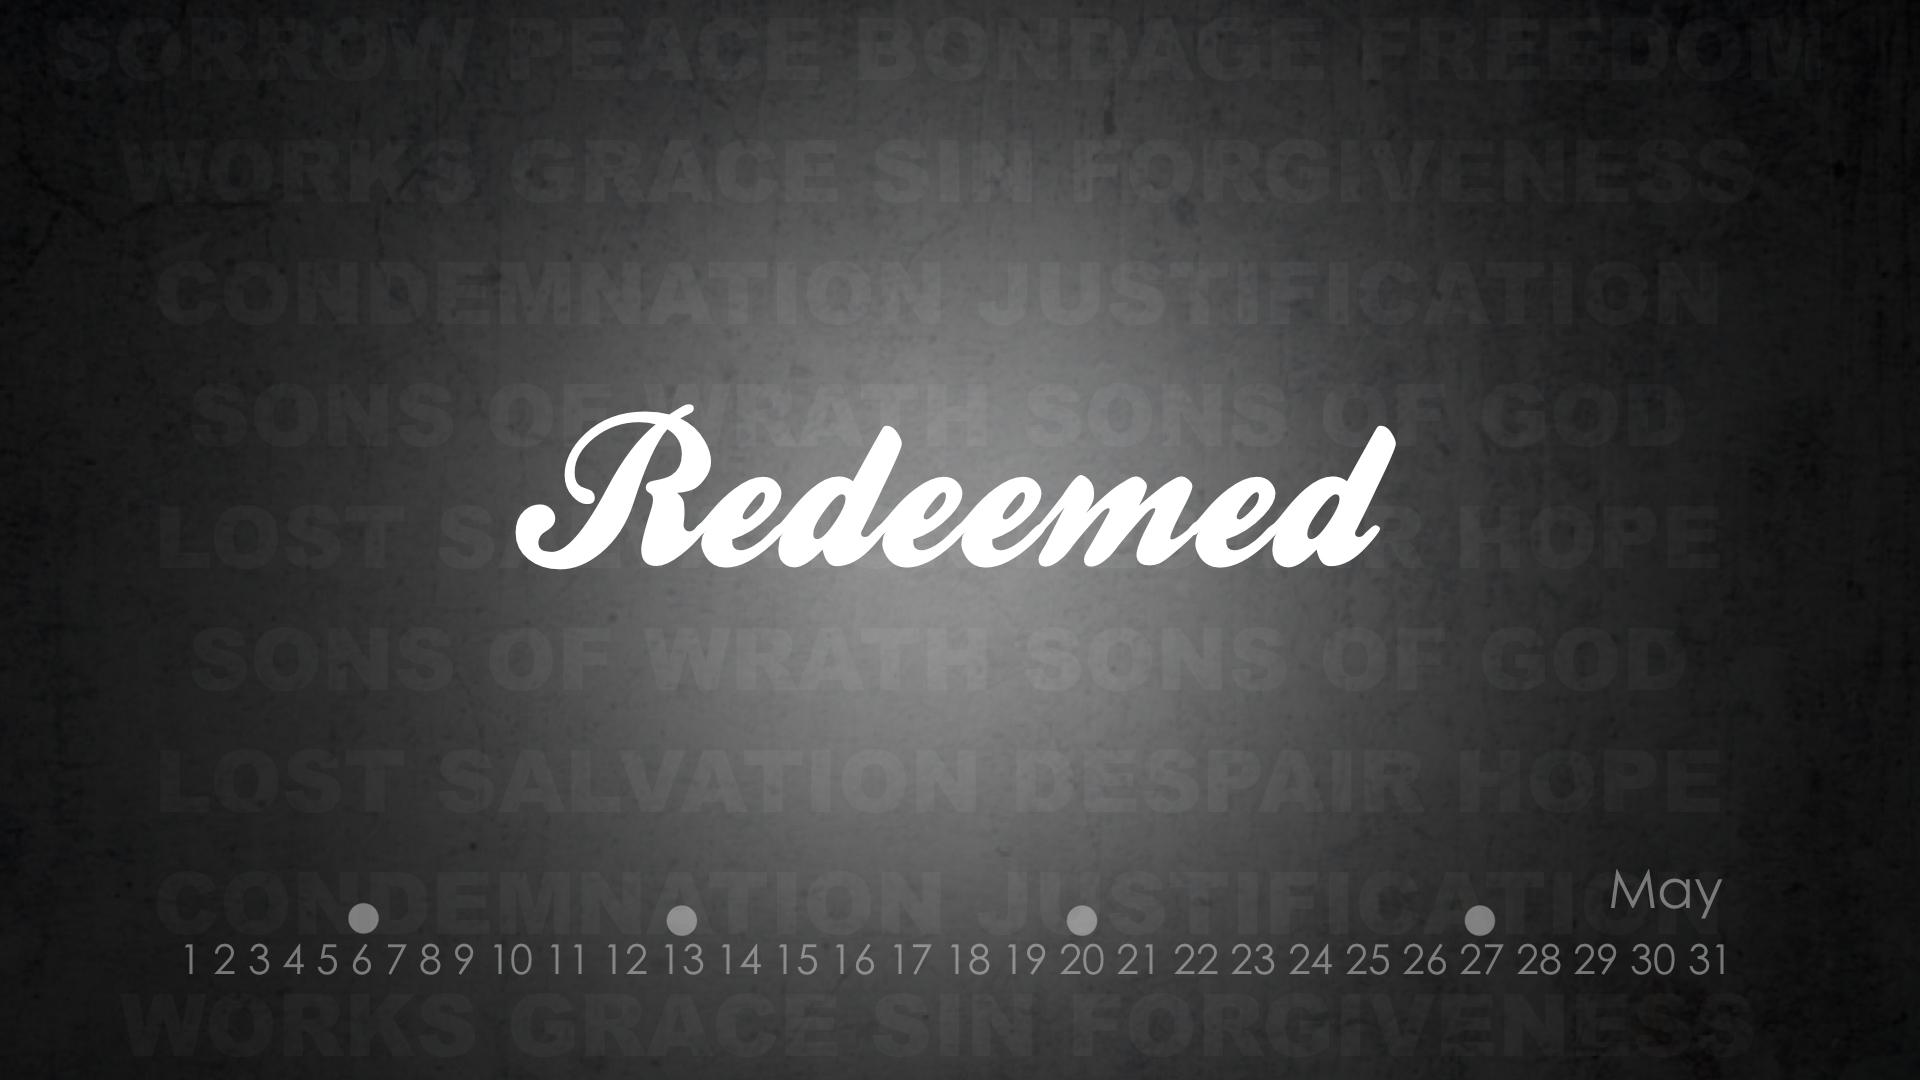 2560x1440 Wallpapers Hd Bible Quotes Free Desktop Wallpaper Calendars May 2012 Tim Challies